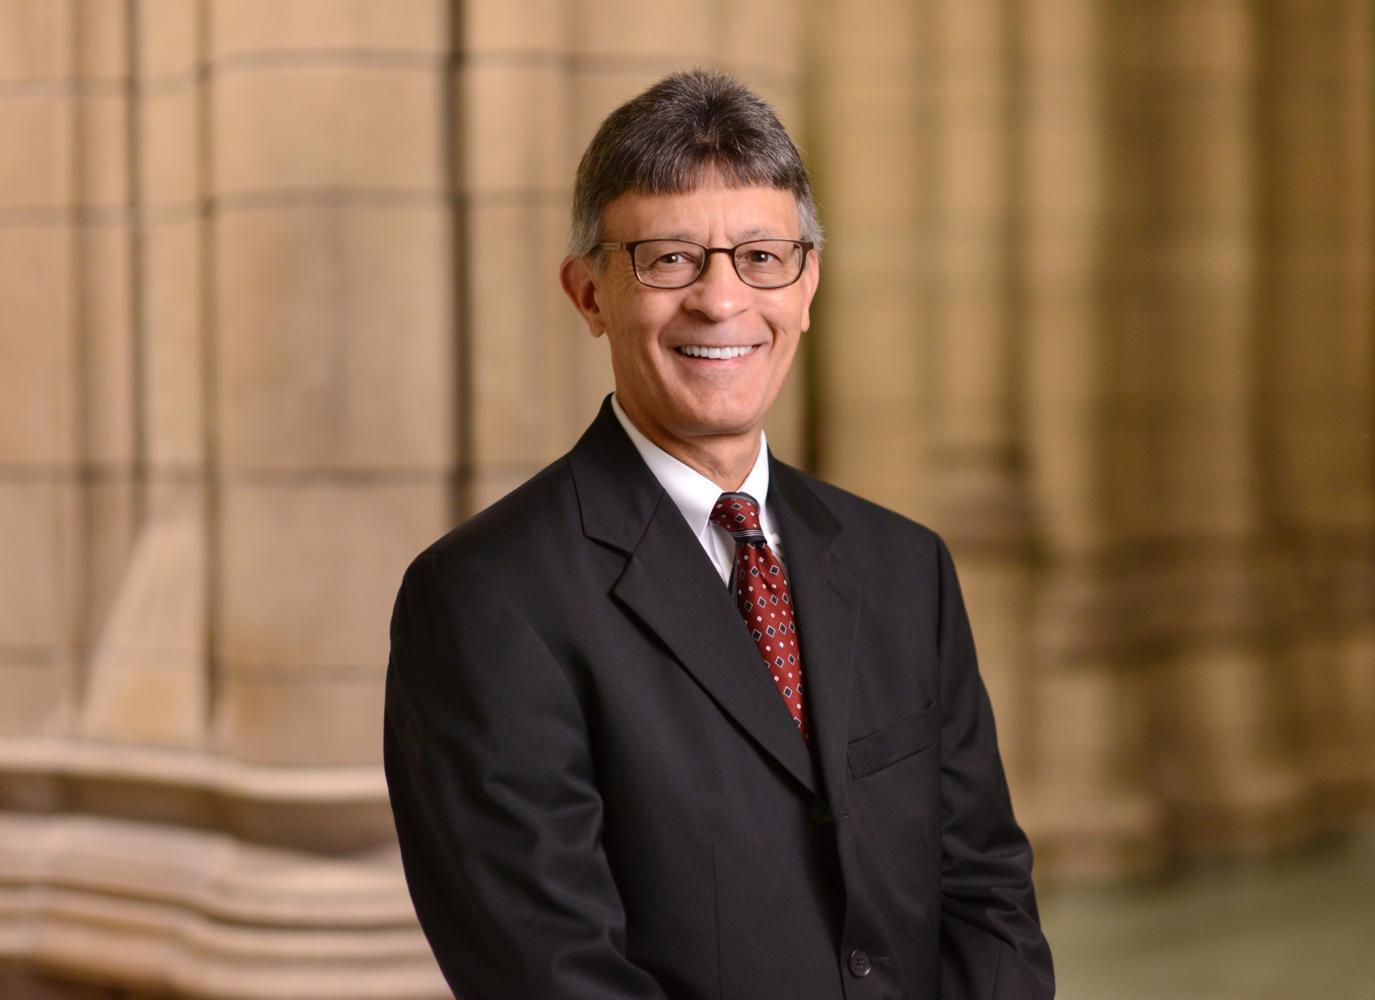 Pitt's CFO Arthur Ramicone will retire in 2018. (Photo courtesy of the University of Pittsburgh)